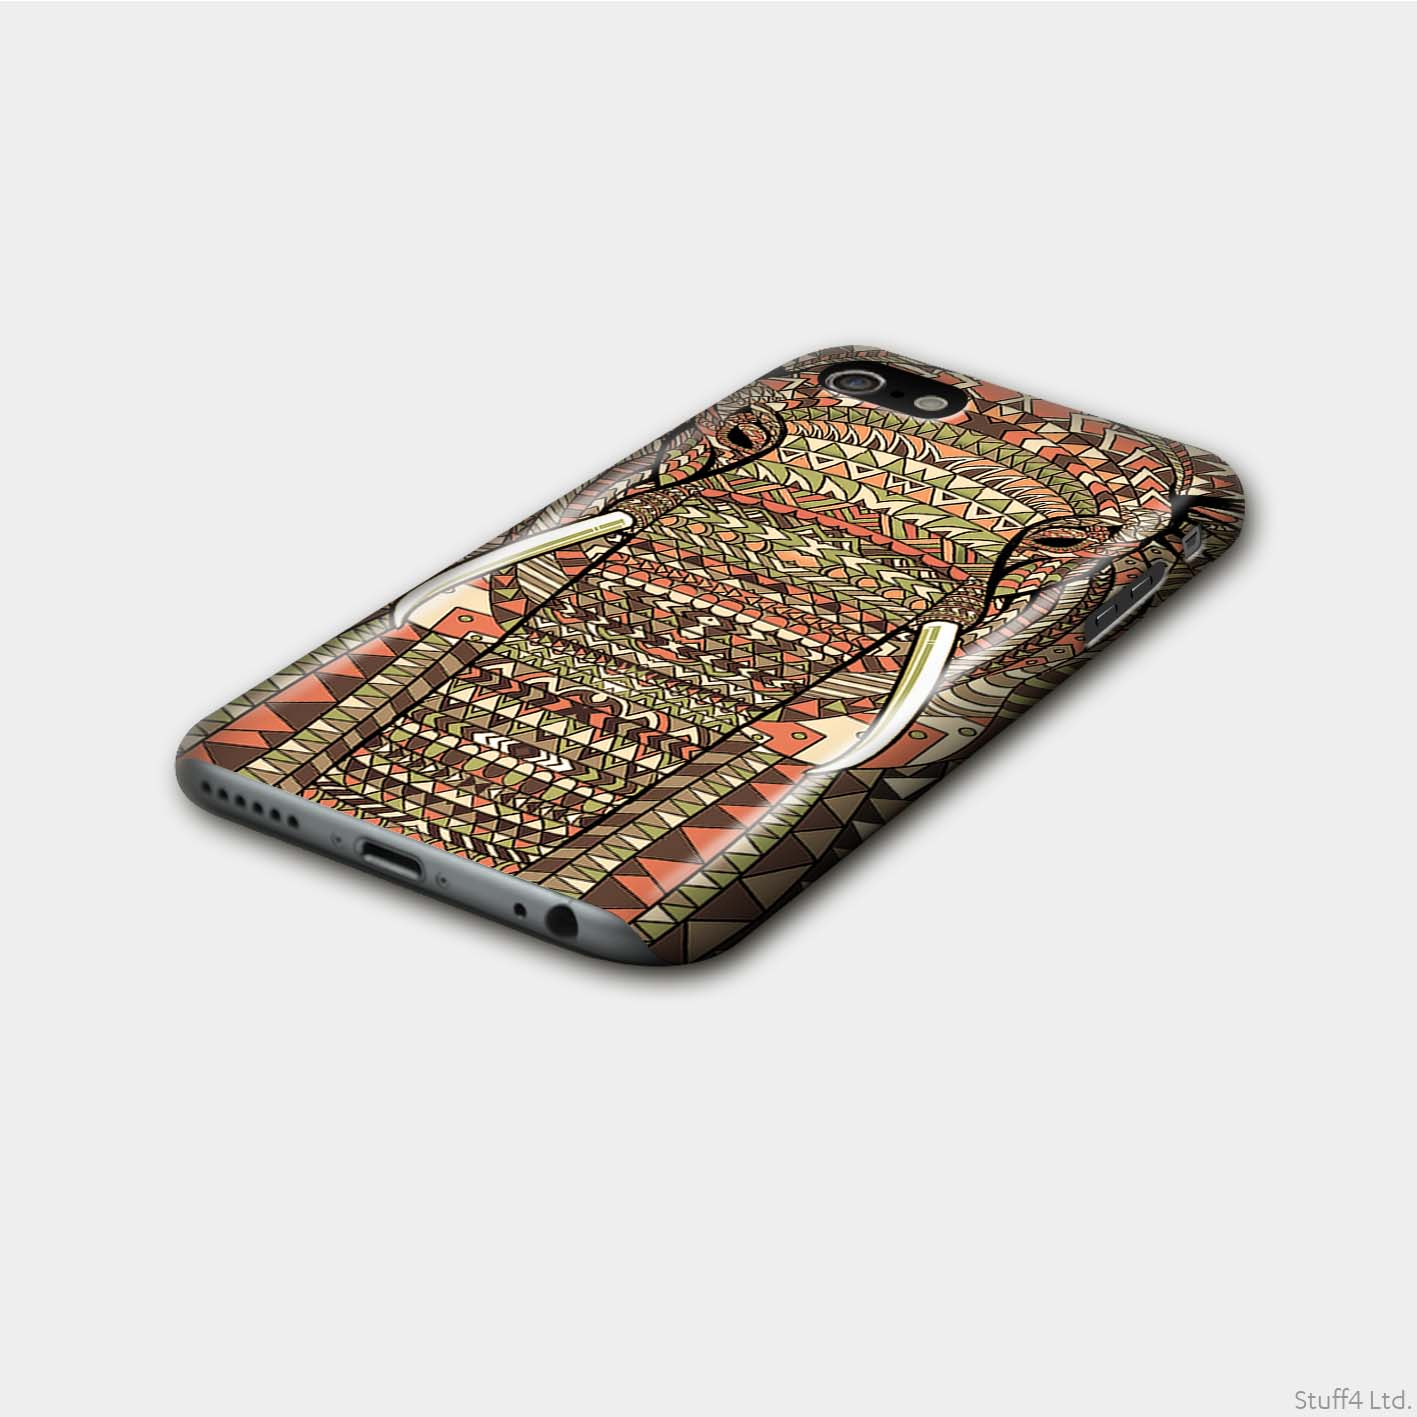 Matte-Phone-Case-for-Apple-iPhone-XR-Aztec-Animal-Design thumbnail 7